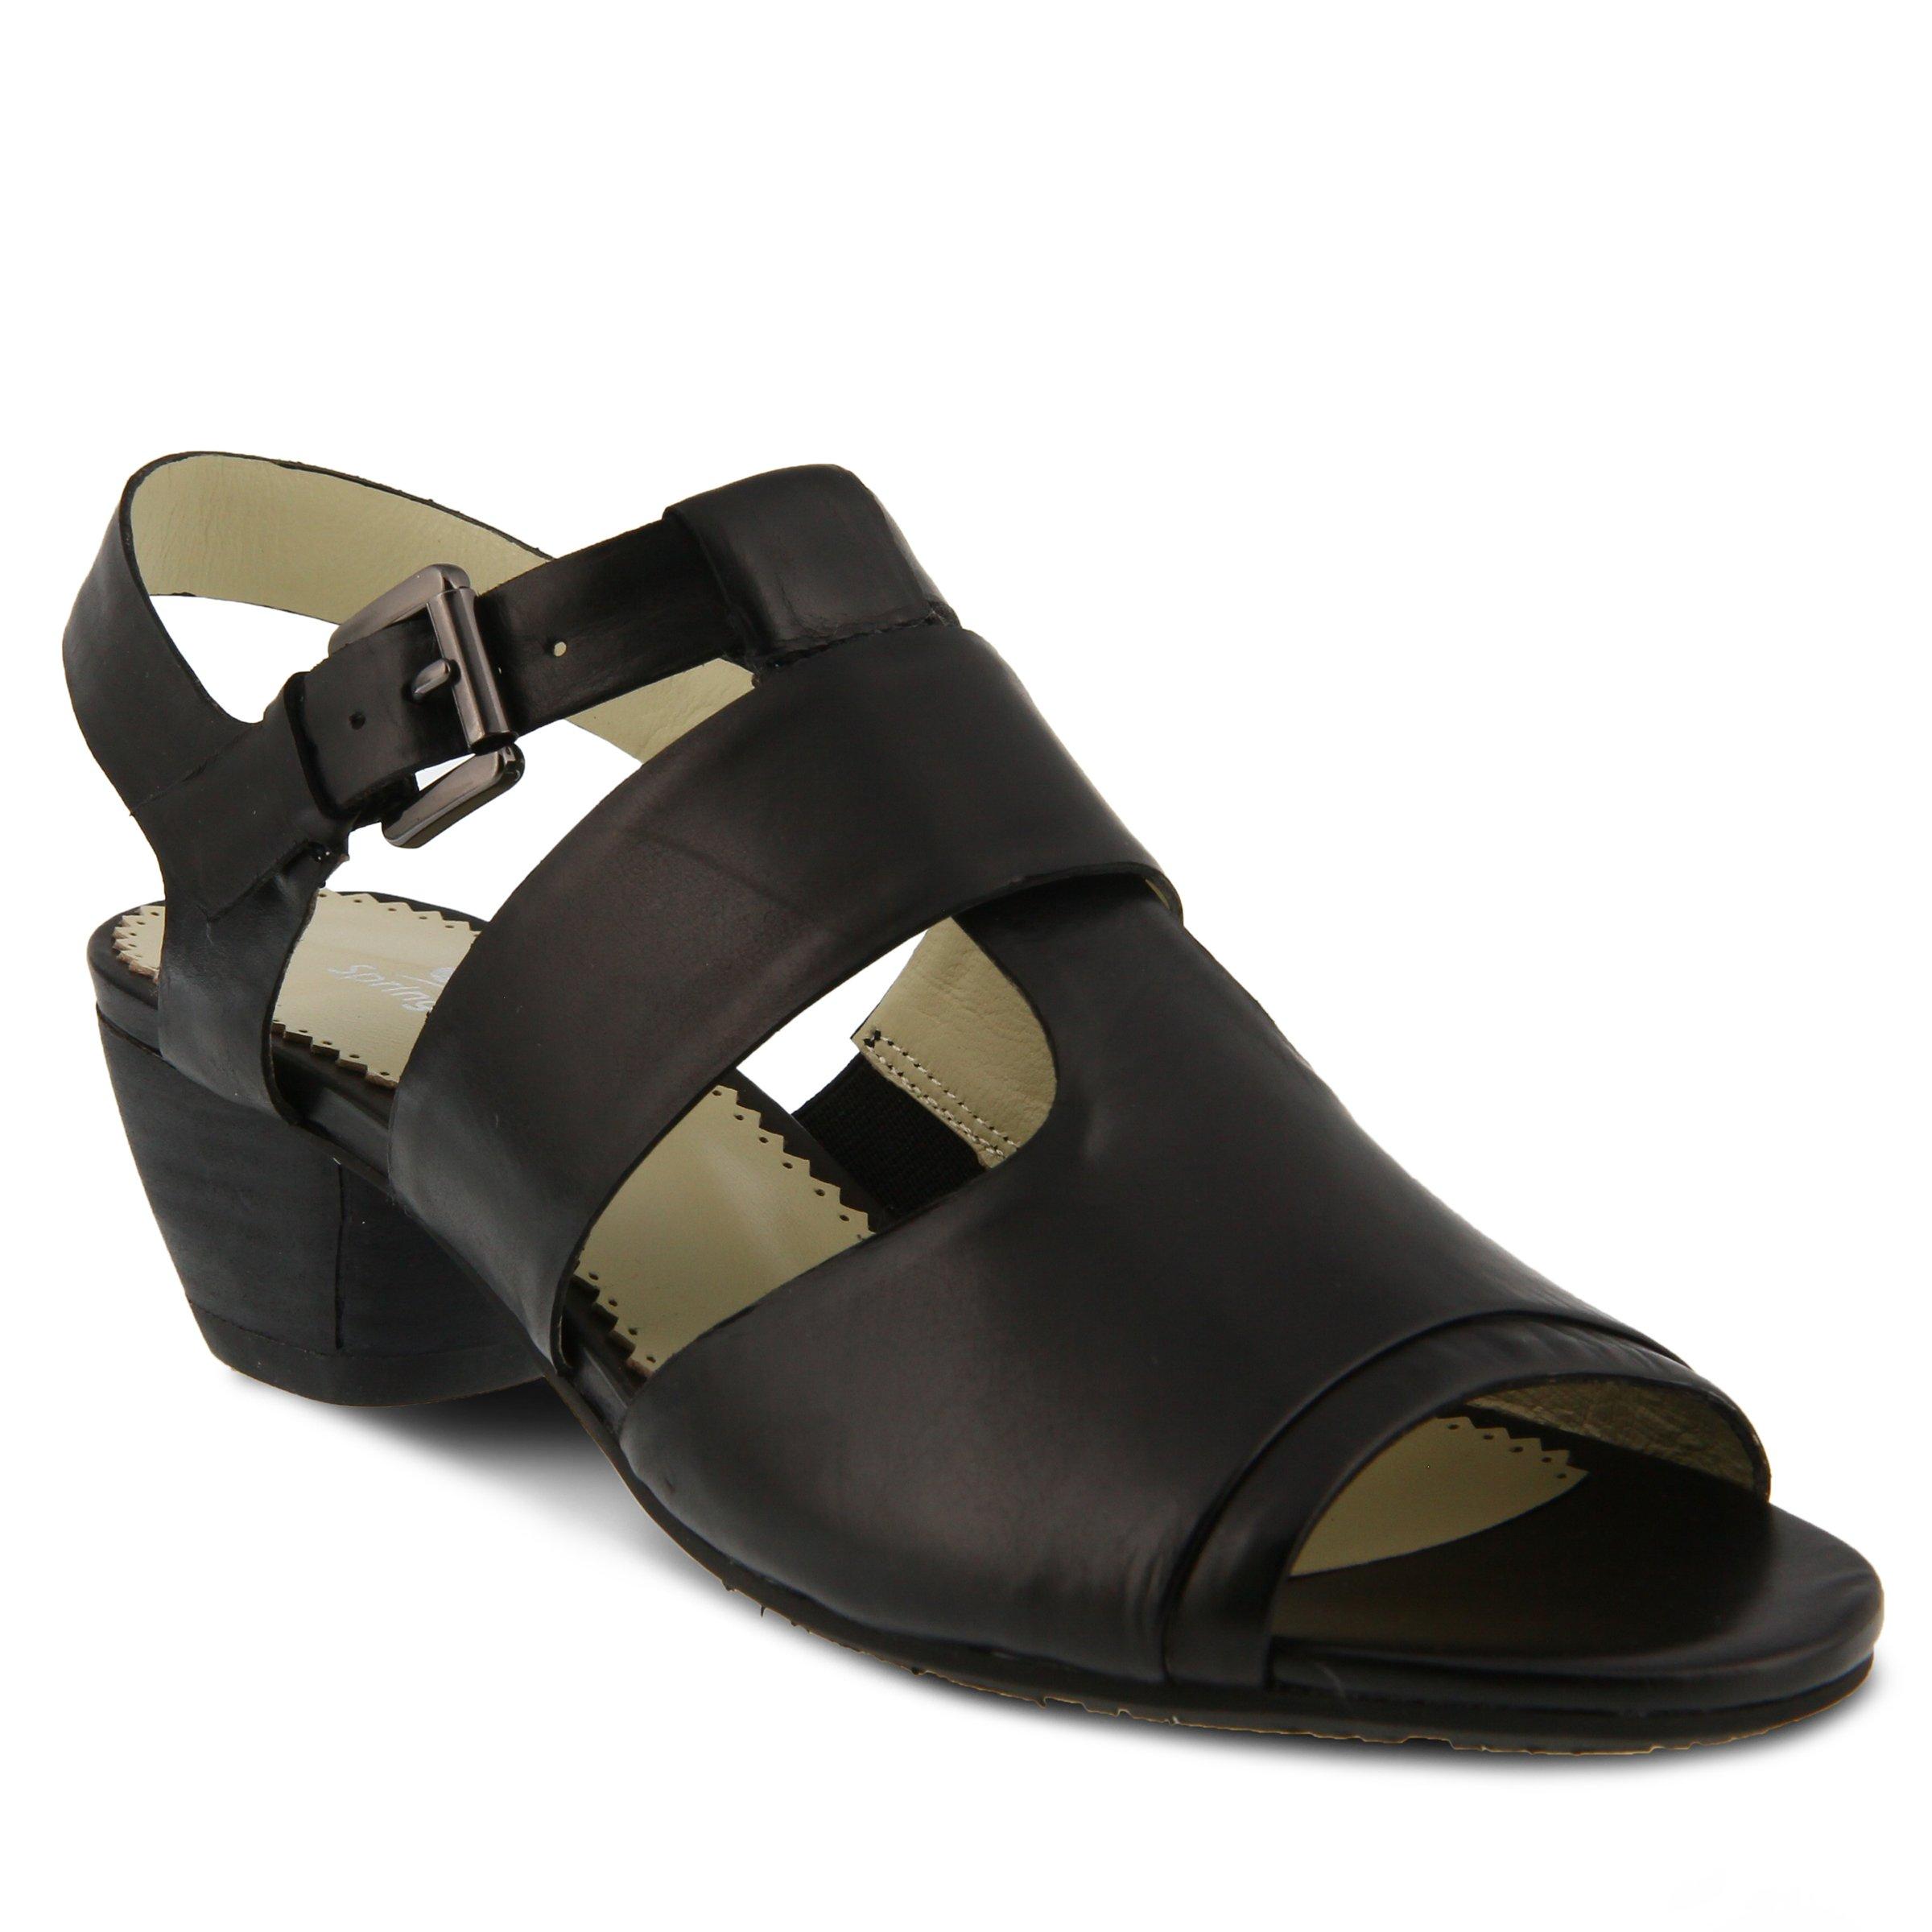 Spring Step Women's Charisse Sandals